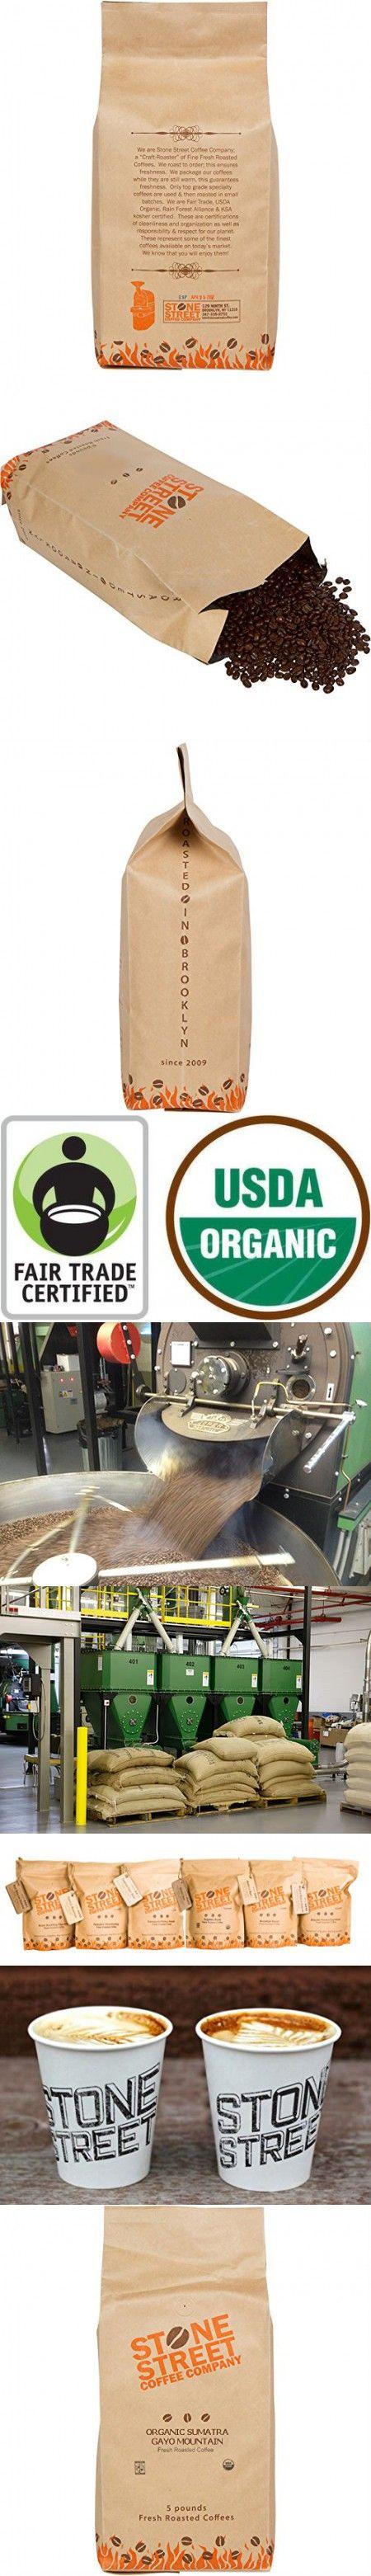 DARK SUMATRA ORGANIC Fair Trade Coffee | Whole Beans | 5 Lb Bulk Large Bag | Premium Select Indonesian Coffee Origin